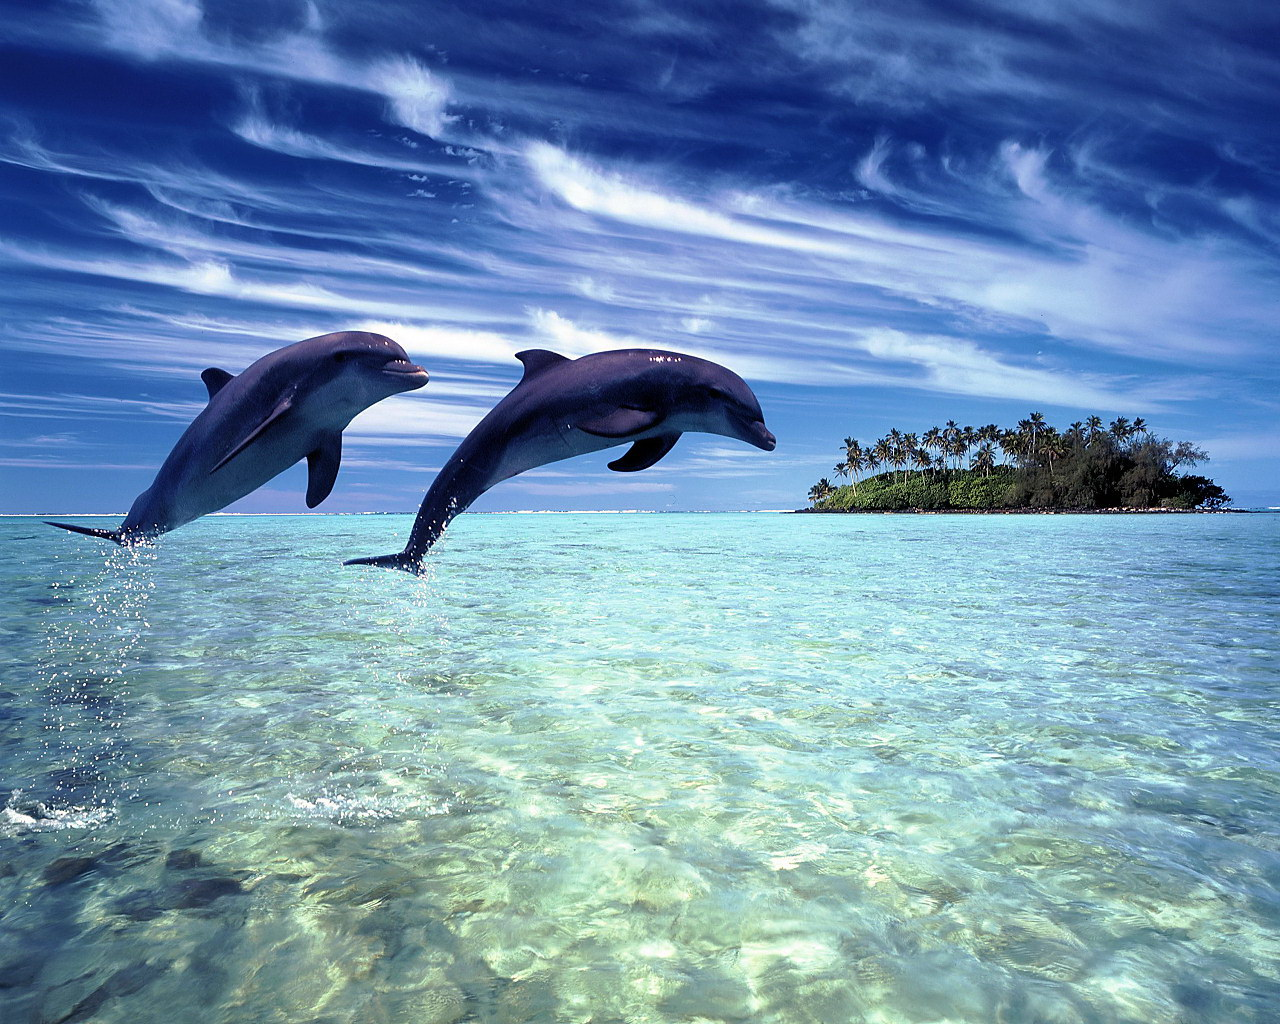 http://1.bp.blogspot.com/_IBR_c6Oy8co/S7JJFEsYpPI/AAAAAAAAIPA/N8fET0UEdPY/s1600/dolphin_7.jpg